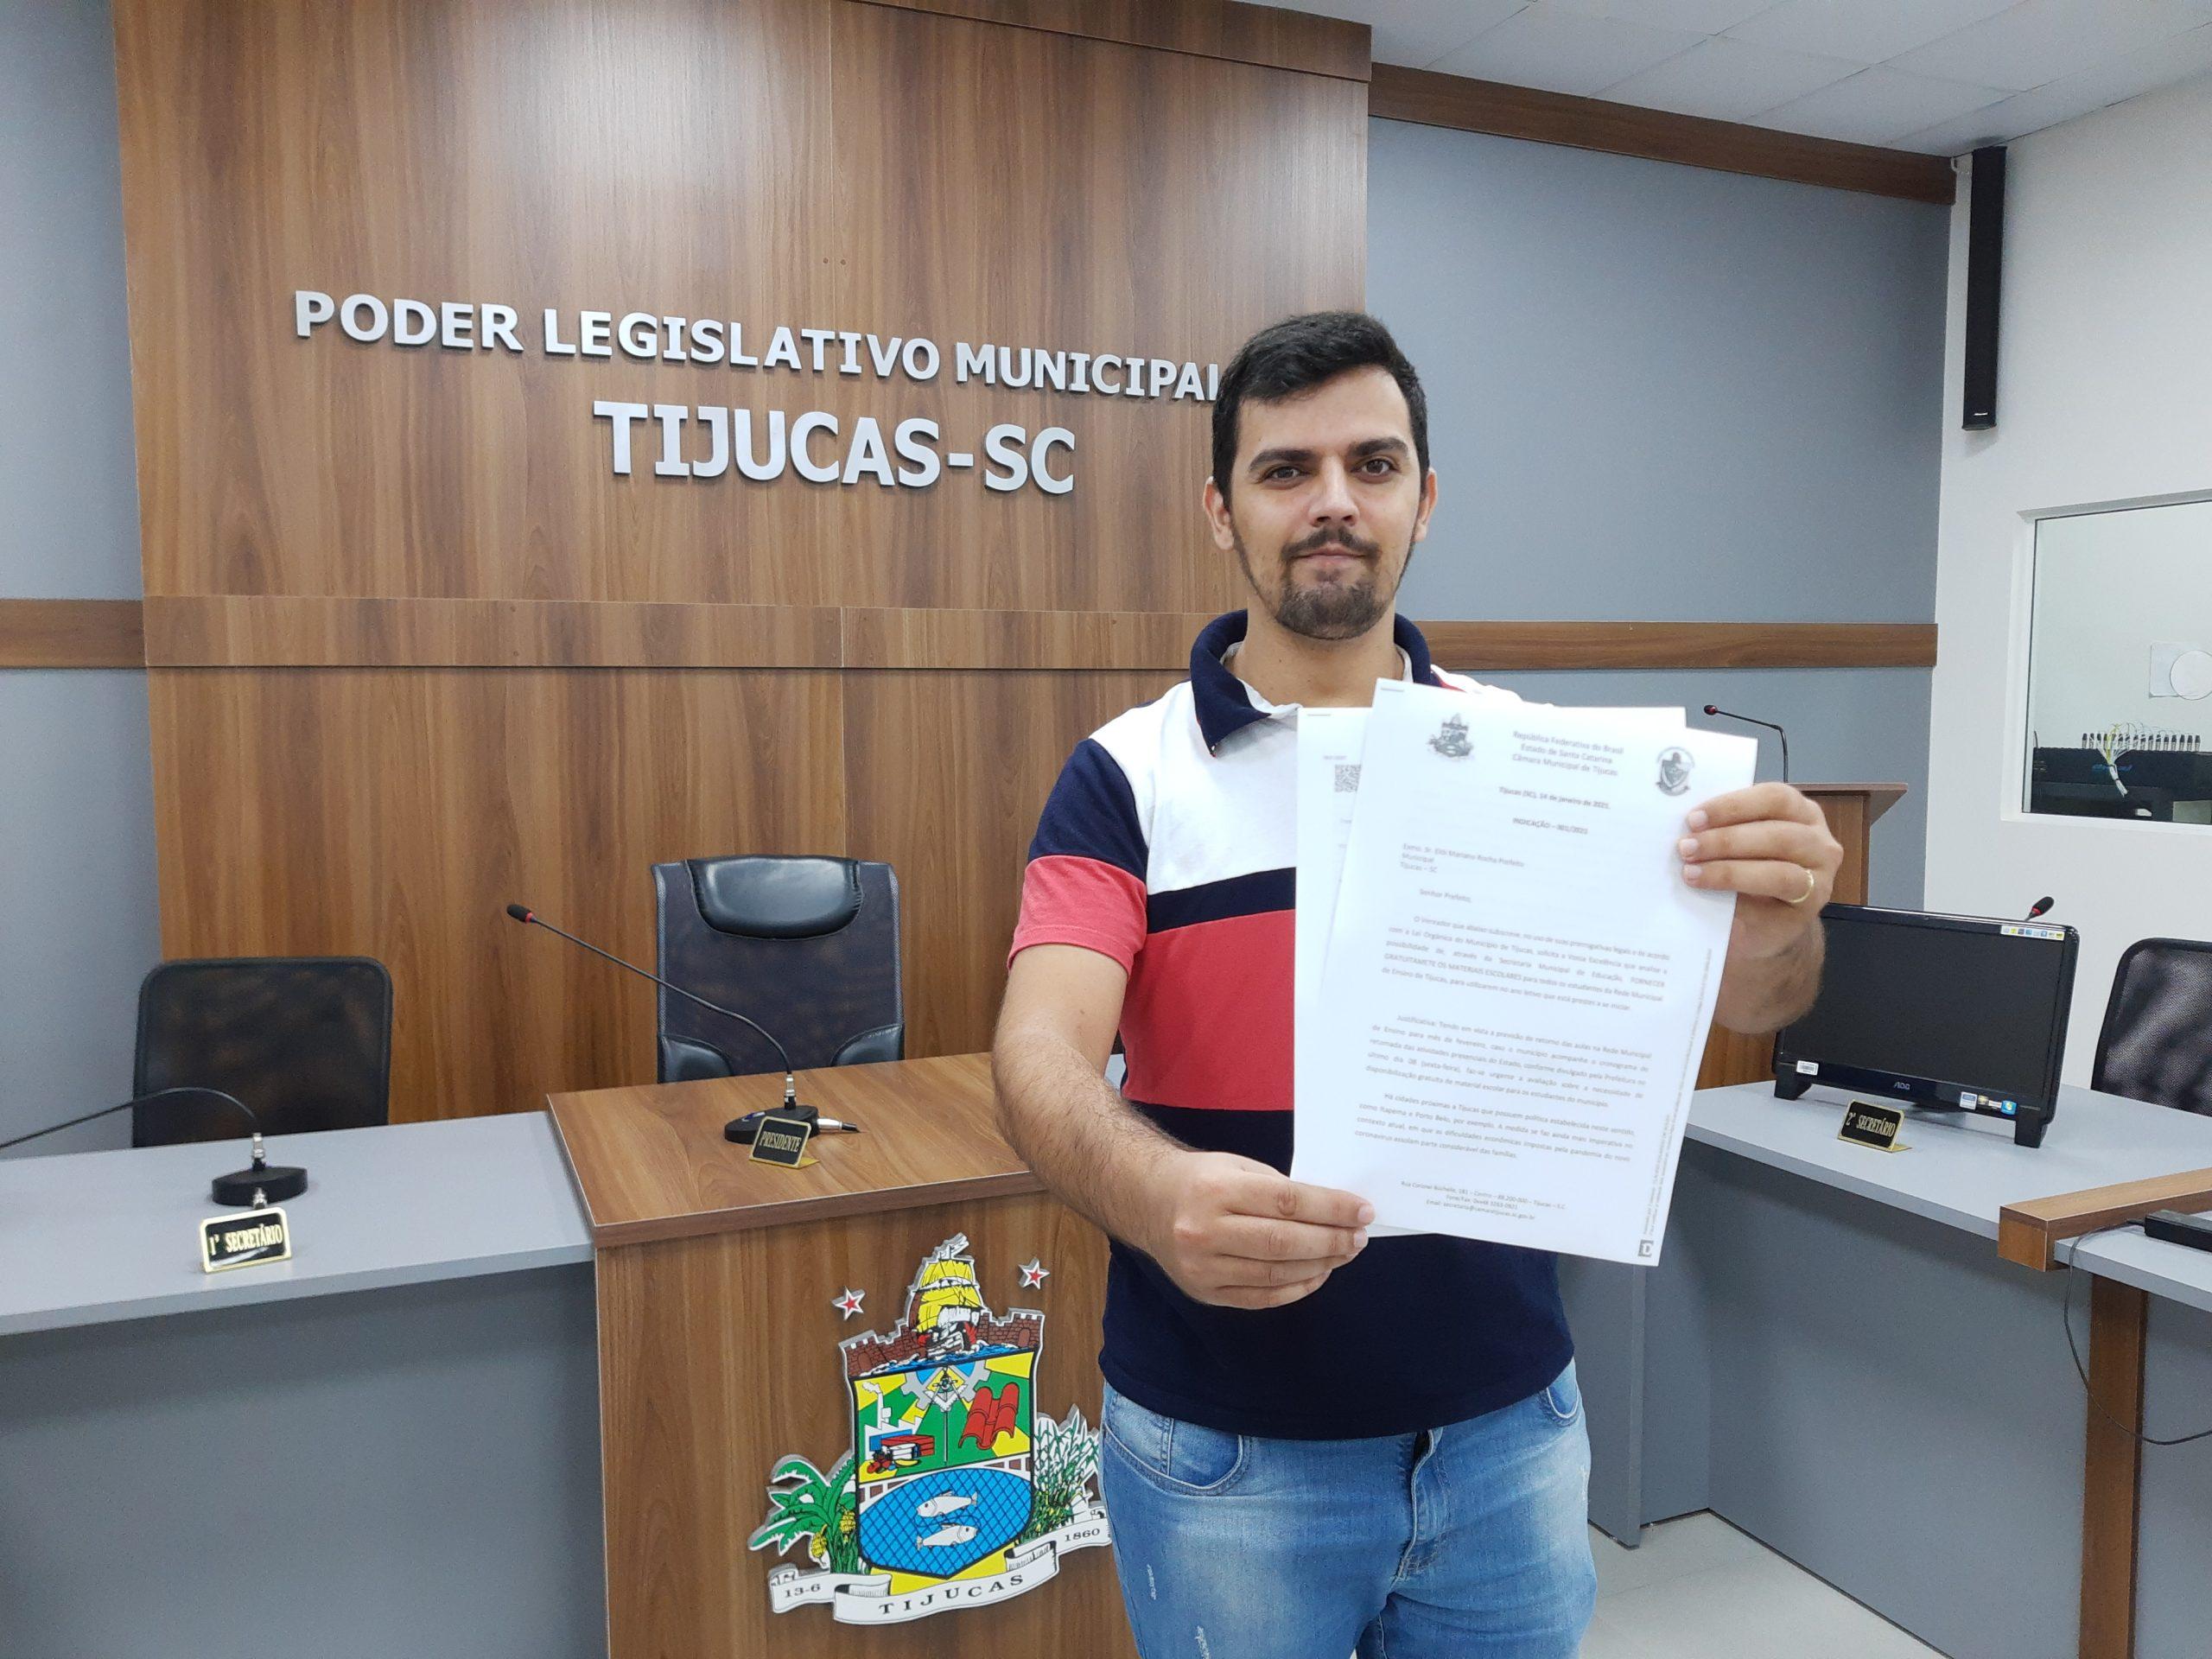 Vereador pede material escolar gratuito para estudantes de Tijucas